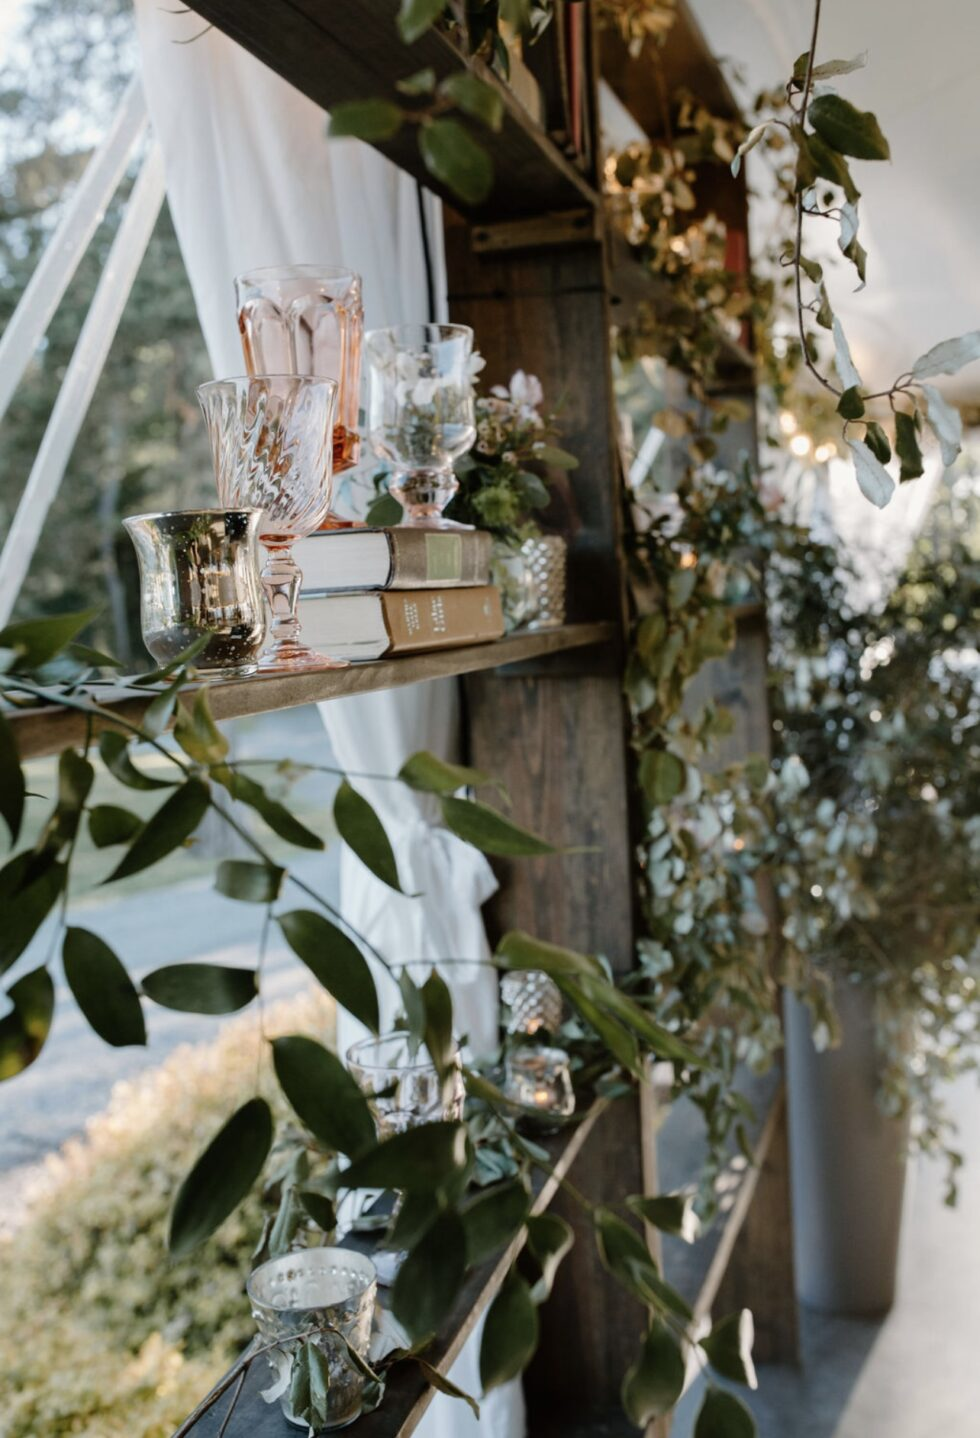 Spring-Wedding-at-Summerfield-Farms-Rachel-and-Brian-56